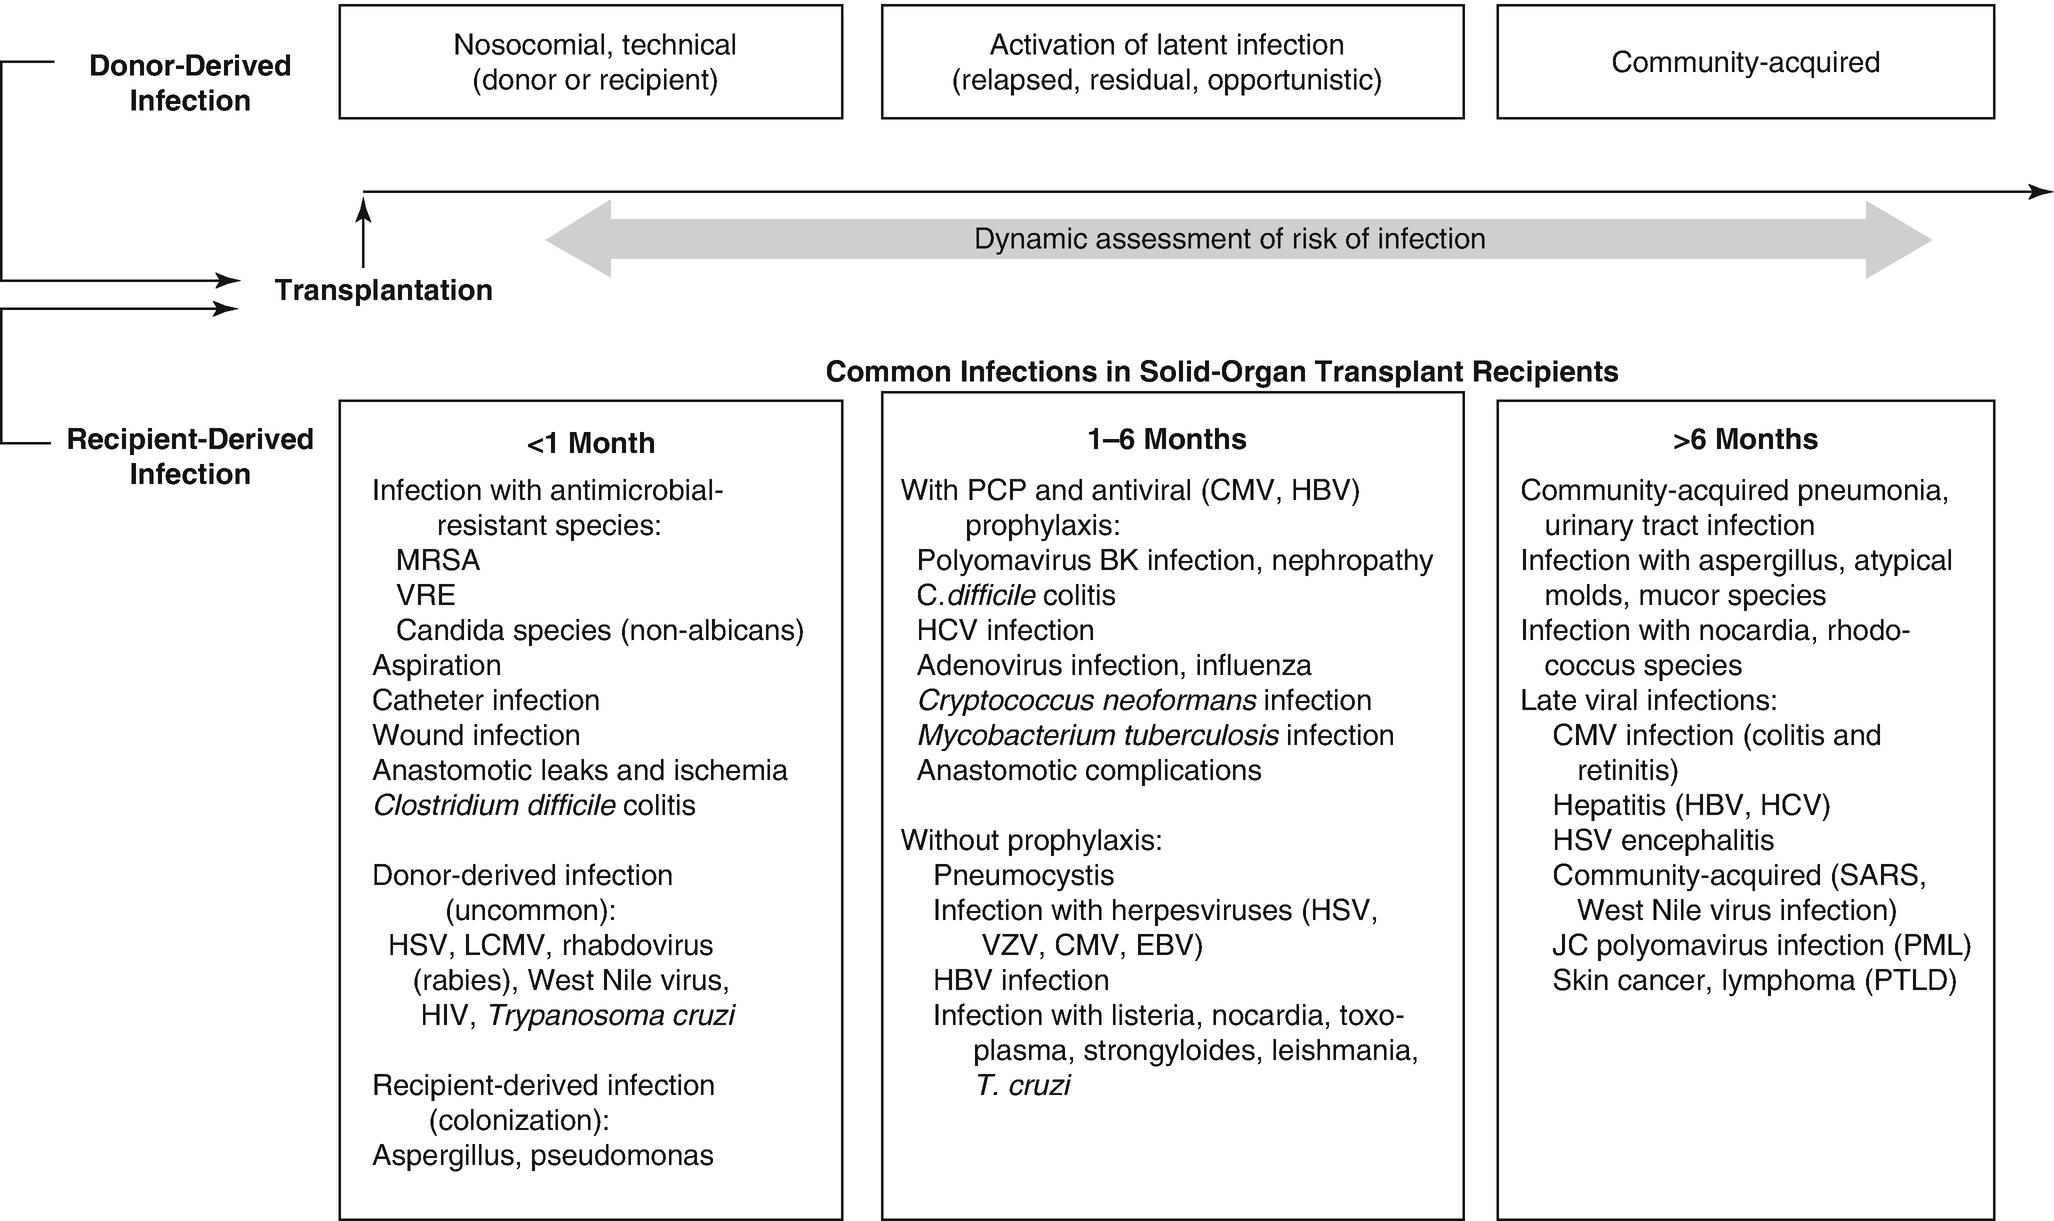 Pharmacokinetics and Pharmacodynamics of Antibiotics in